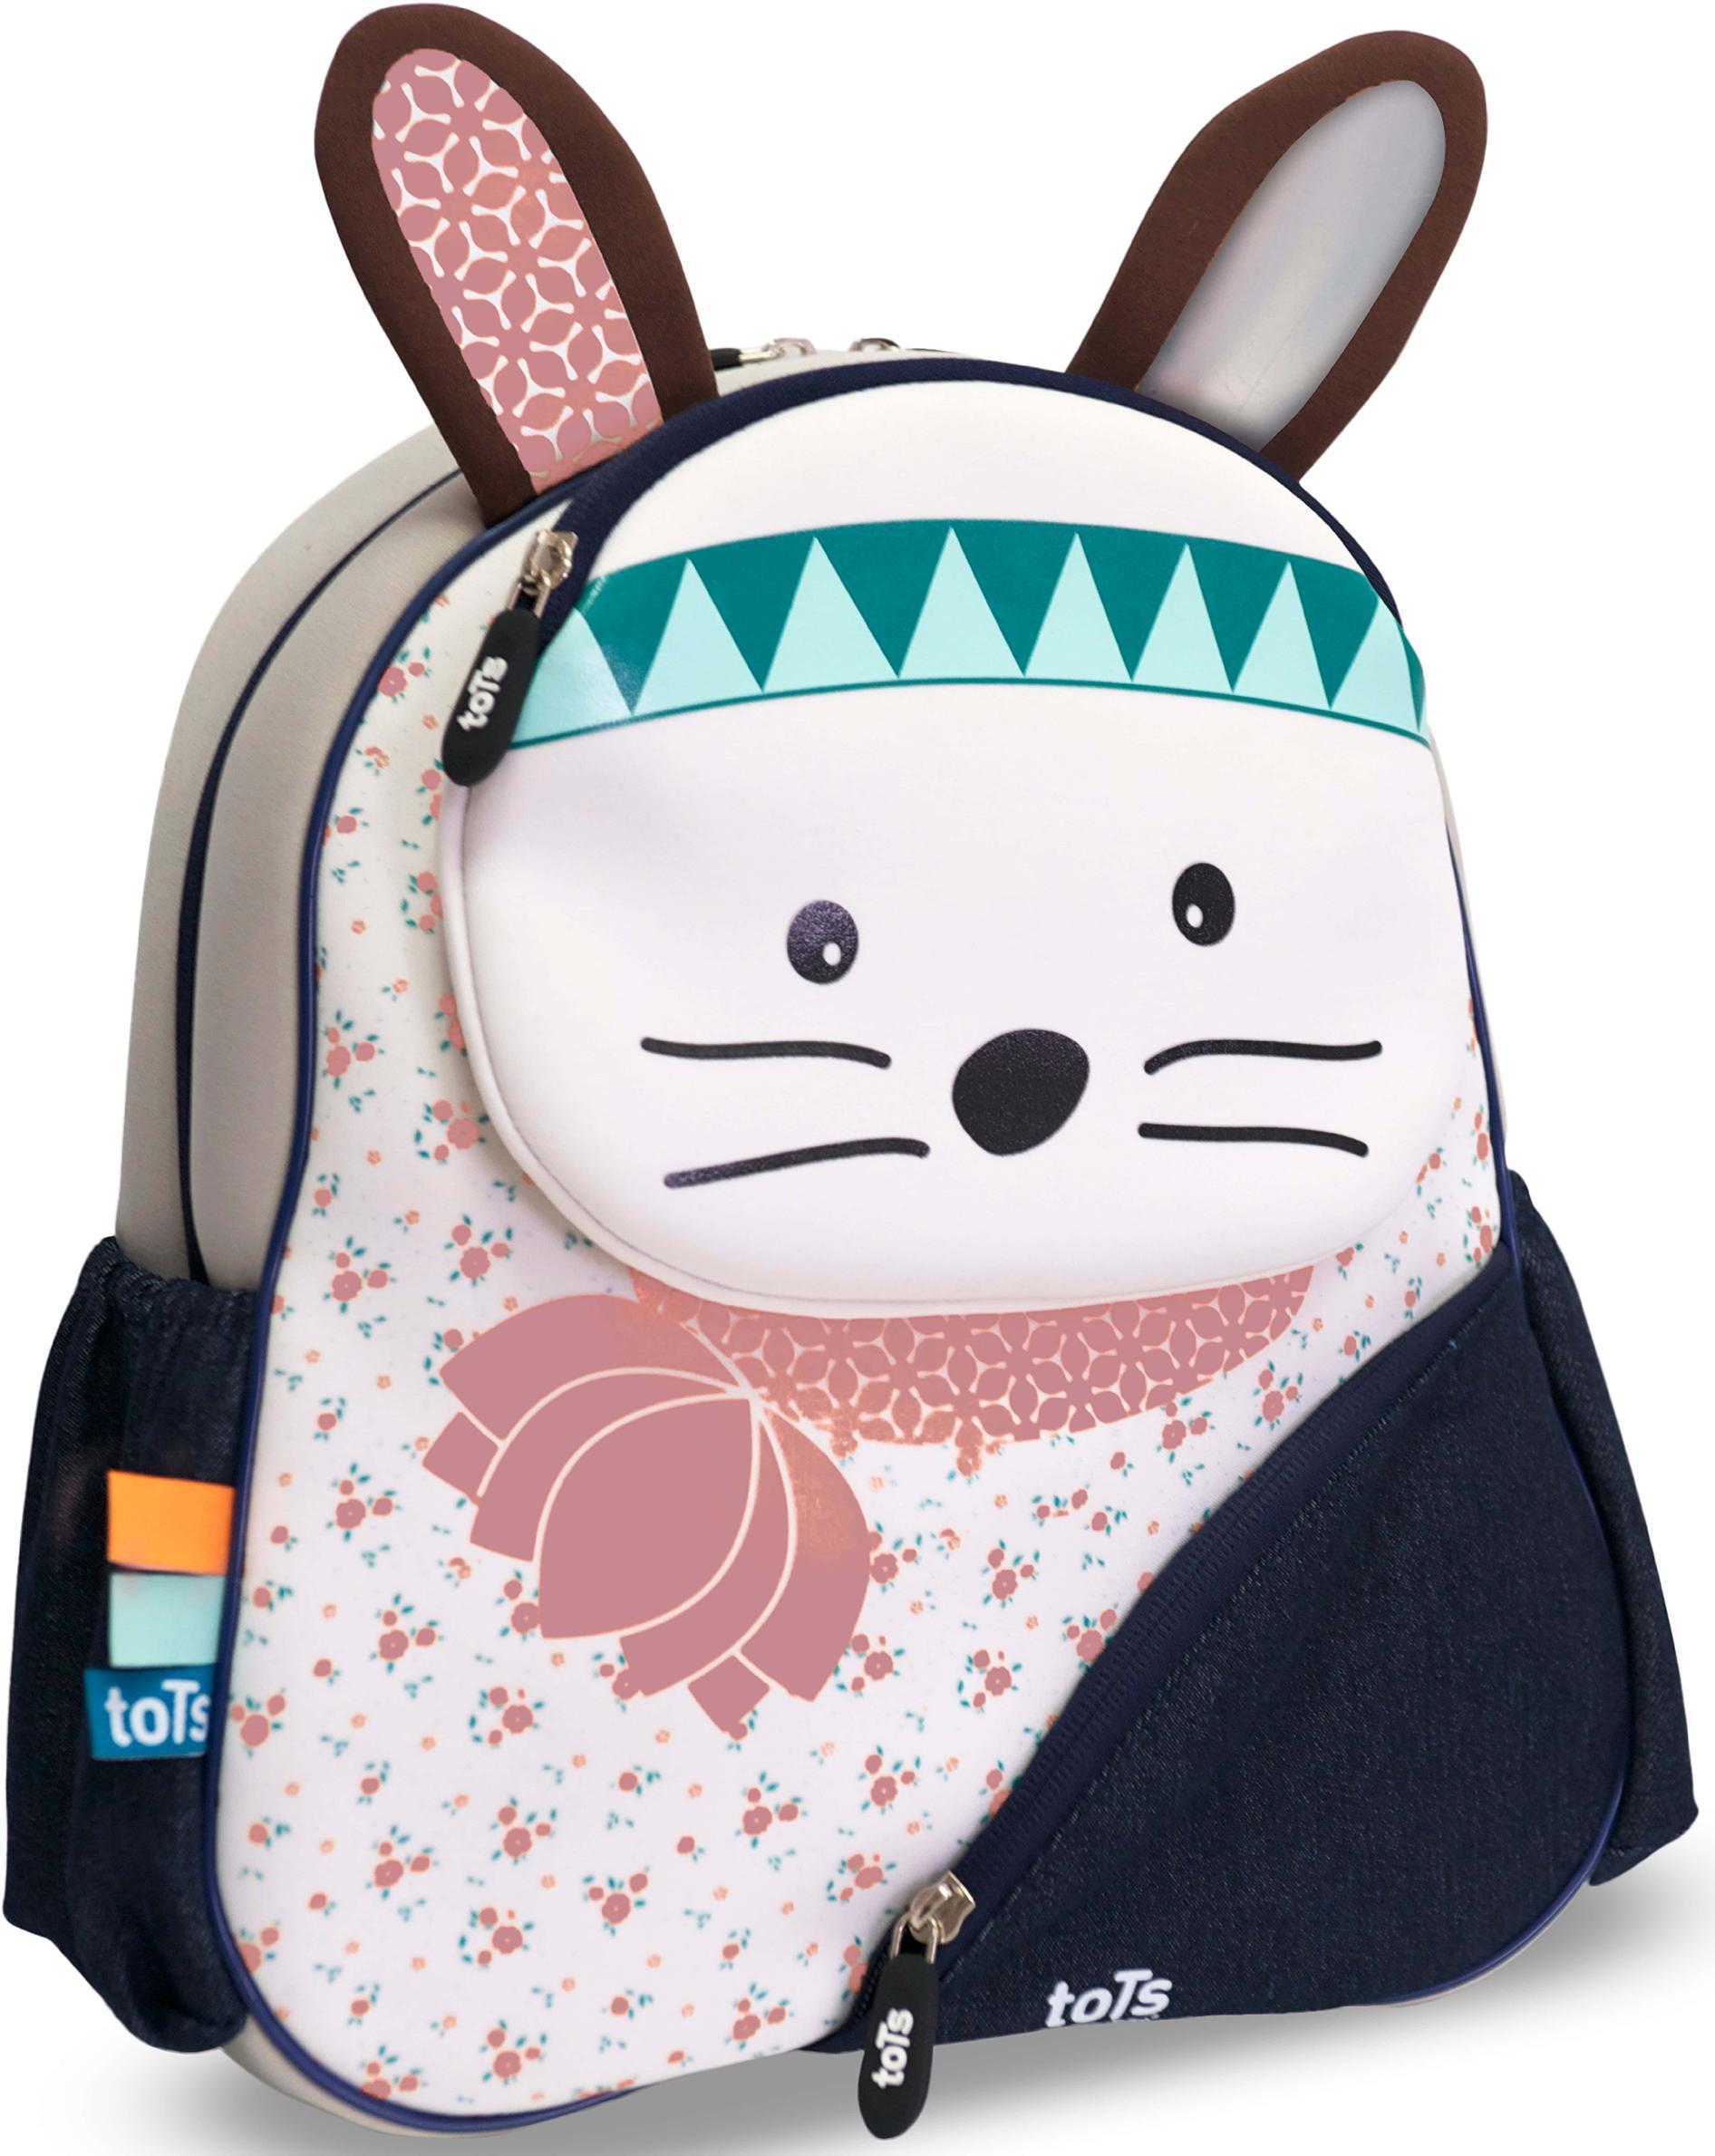 SmarTrike® Kindergartenrucksack, »toTs by SmarTrike® Fur-ever Hase« | Taschen > Rucksäcke > Sonstige Rucksäcke | Pink | Ab | SMARTRIKE